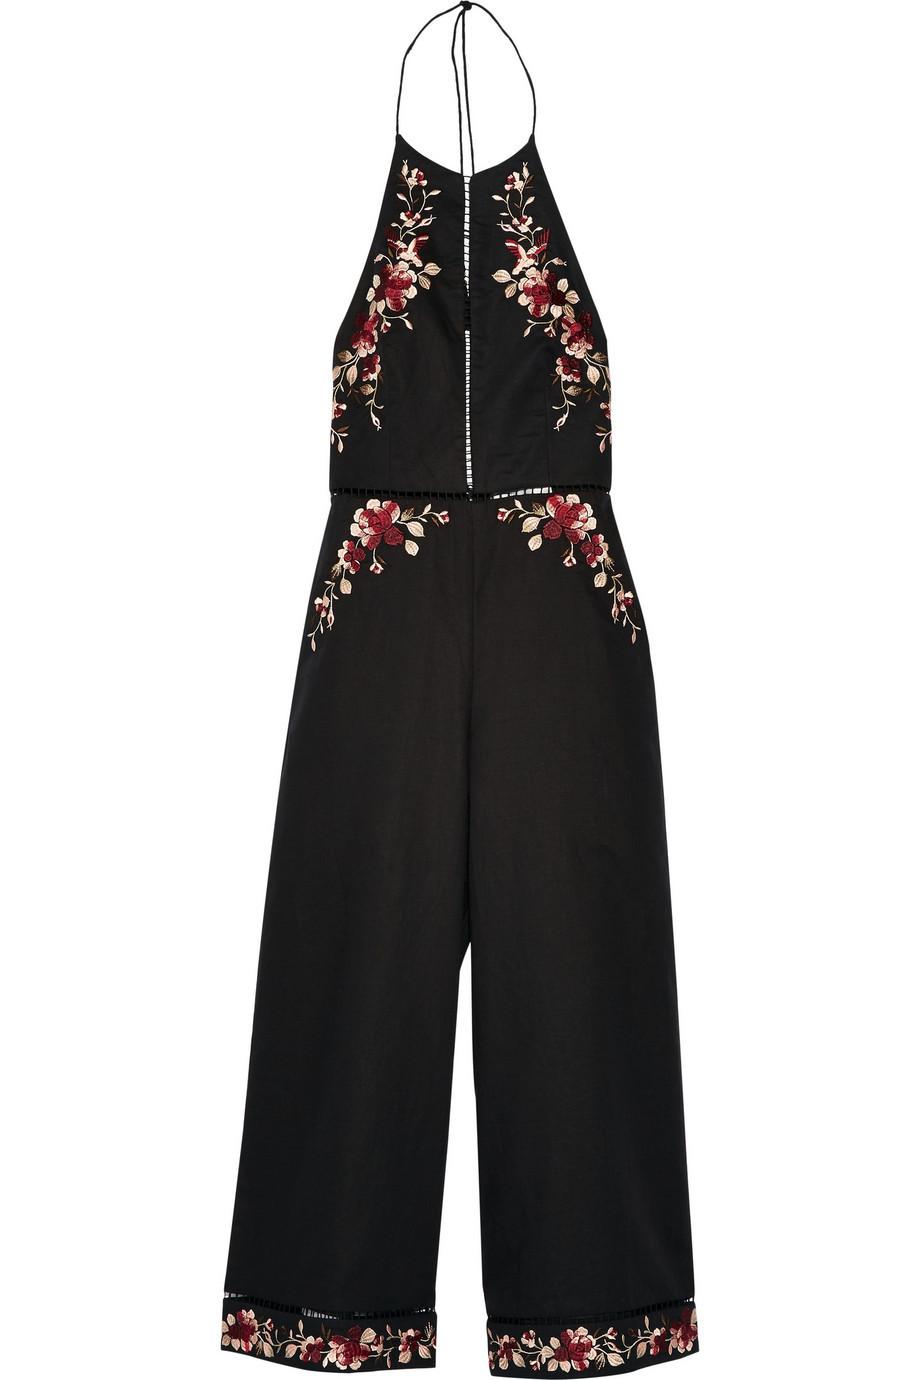 bc55f841b5b Zimmermann Sakura Embroidered Linen and Cotton-Blend Jumpsuit in black